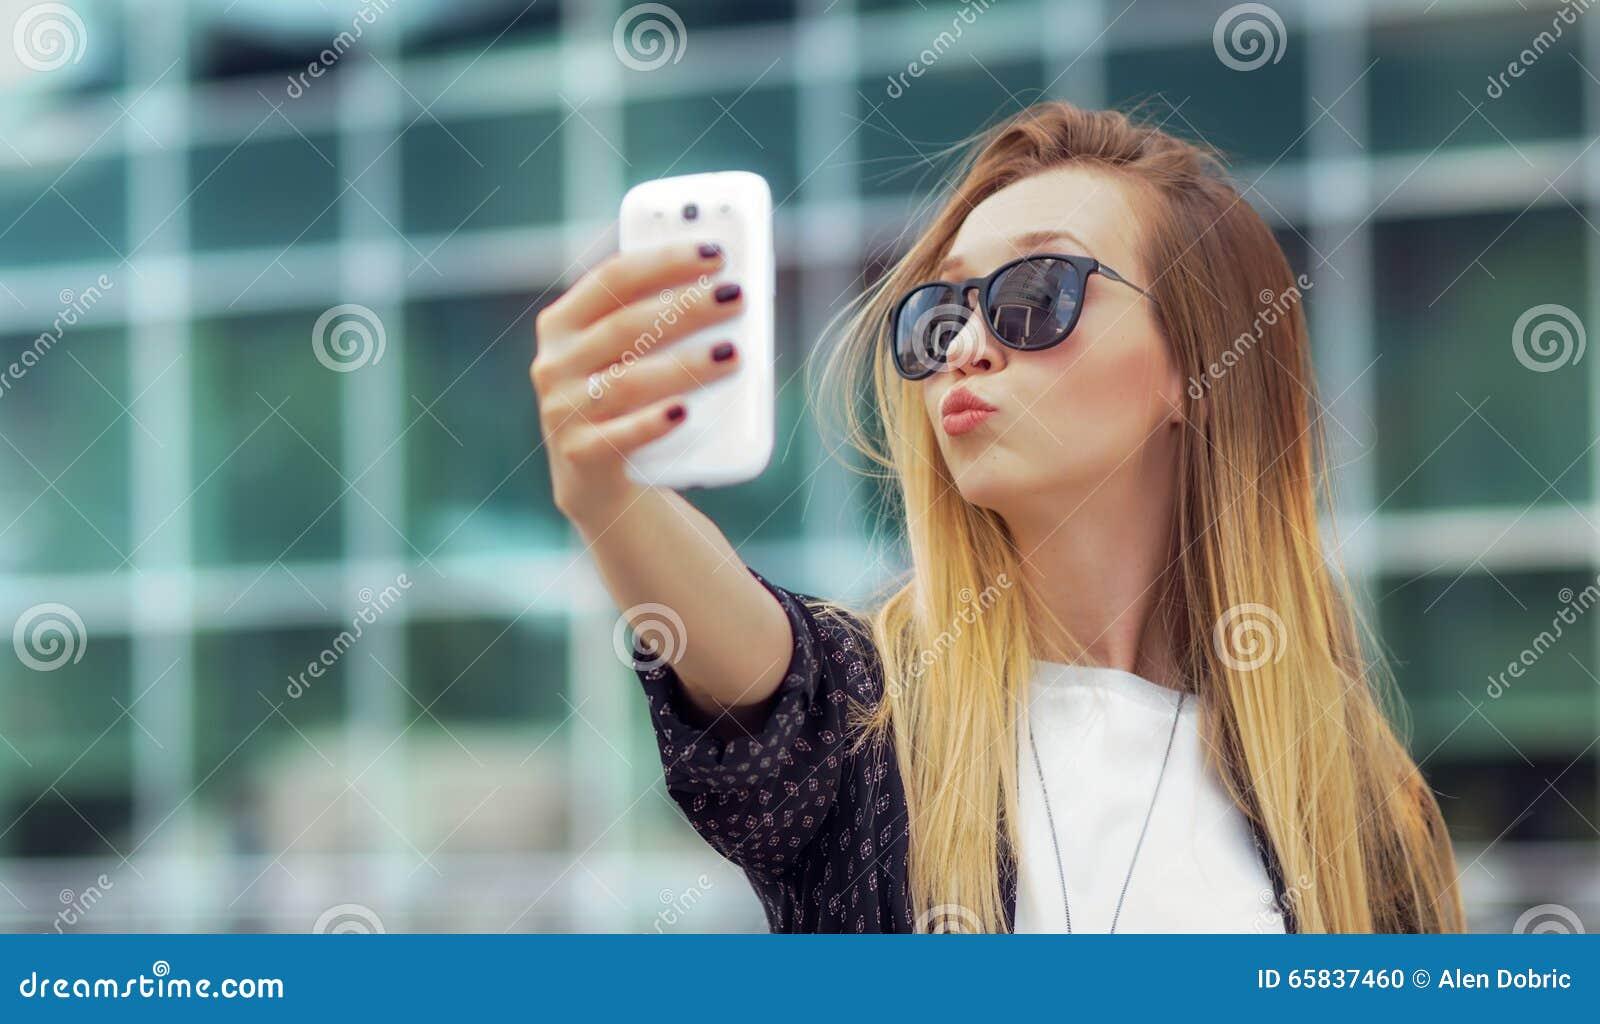 La ragazza d avanguardia fa un selfie